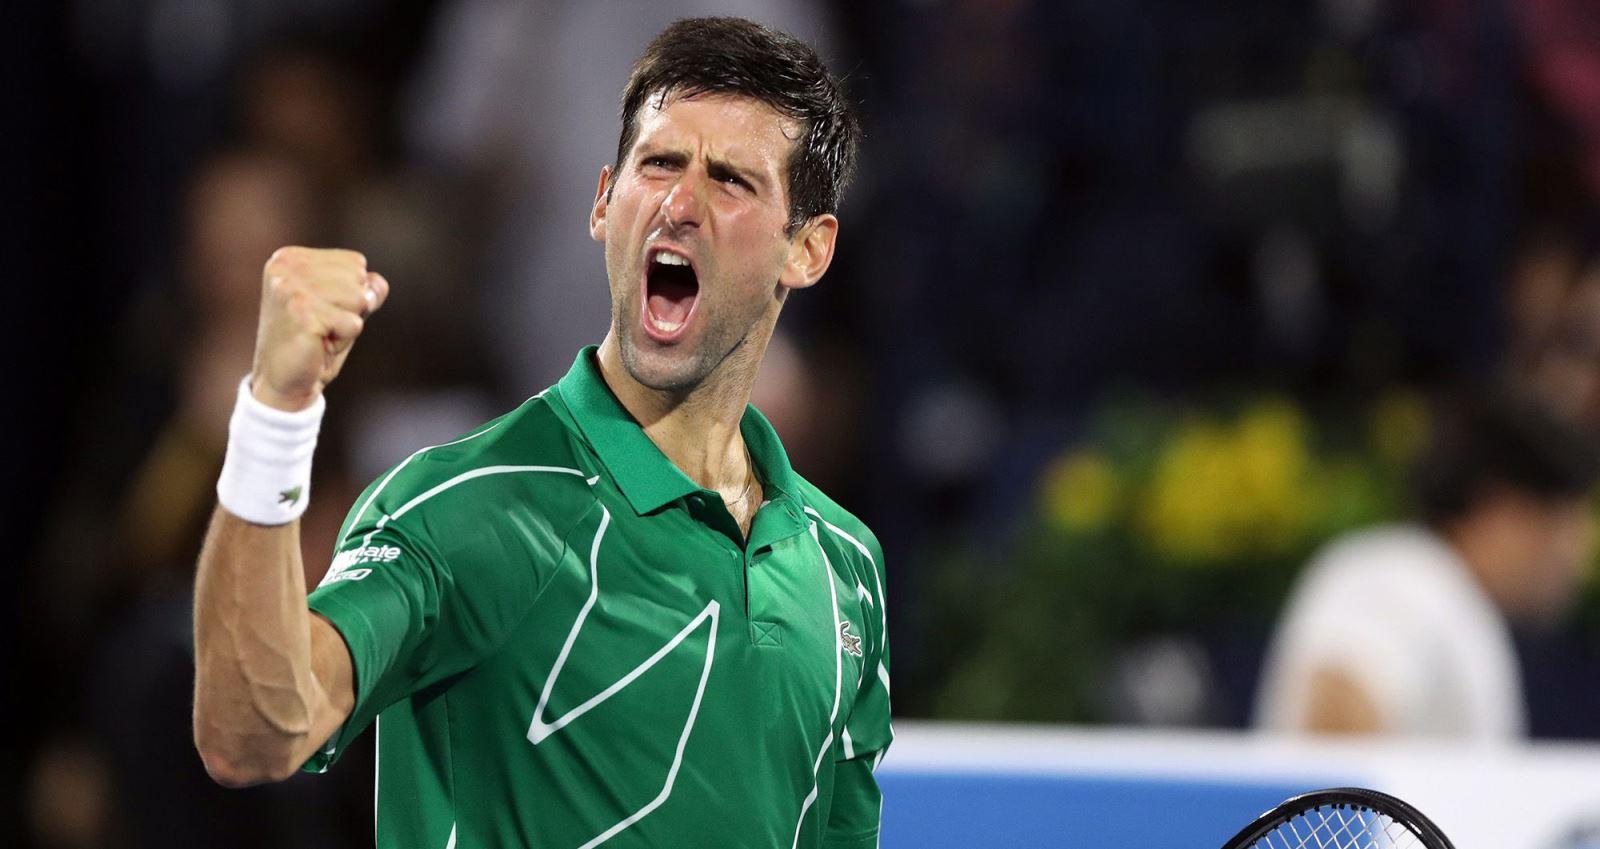 US Open 2020, US Open, quần vợt, tennis, Novak Djokovic, giải mỹ mở rộng, Grand Slam